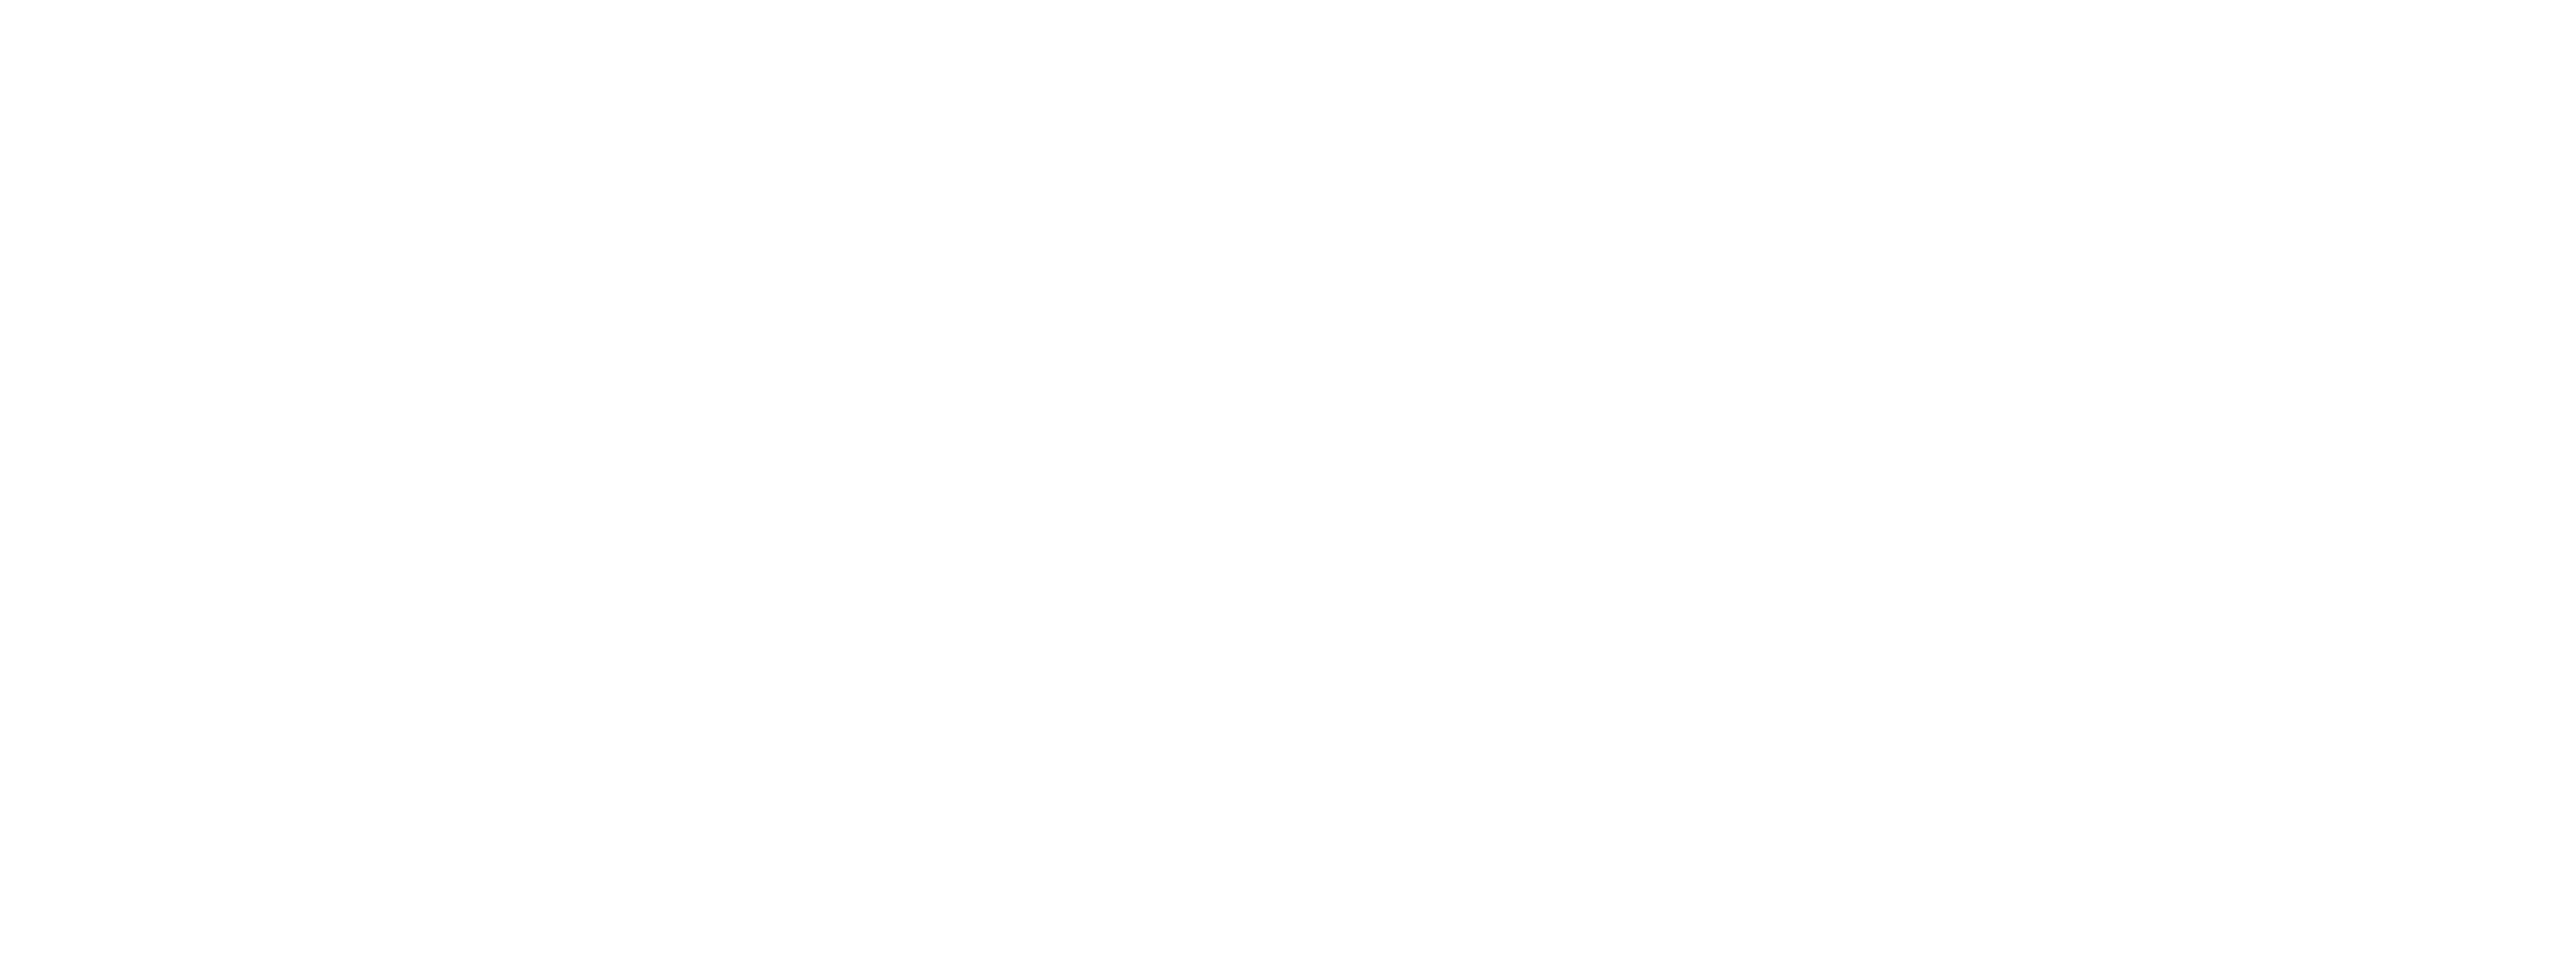 turning tires white logo